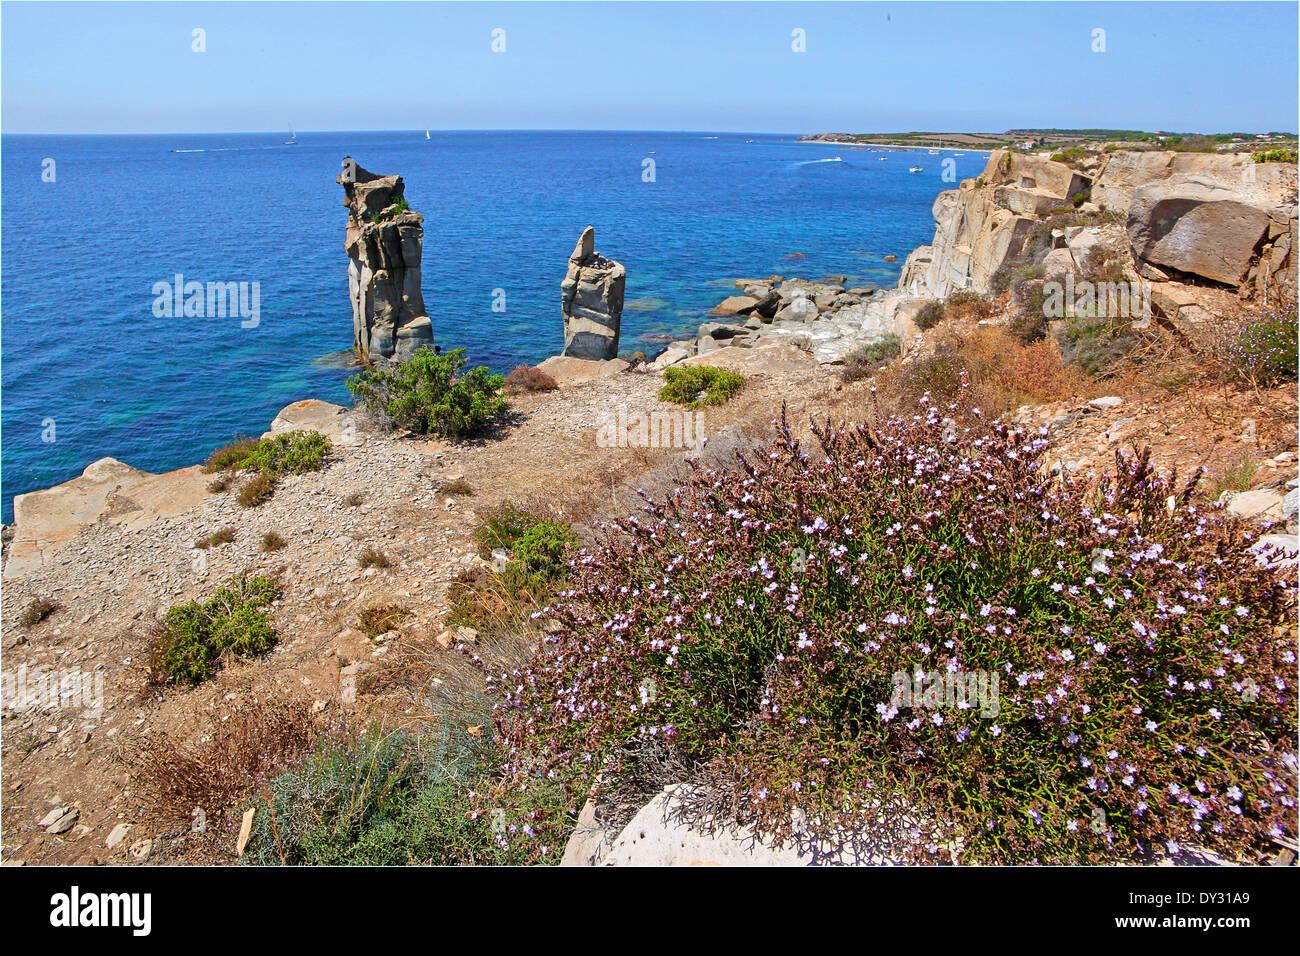 Shrub of Statice or Sea Levender (Limonium) at 'Le Colonne' San Pietro Island - Stock Image